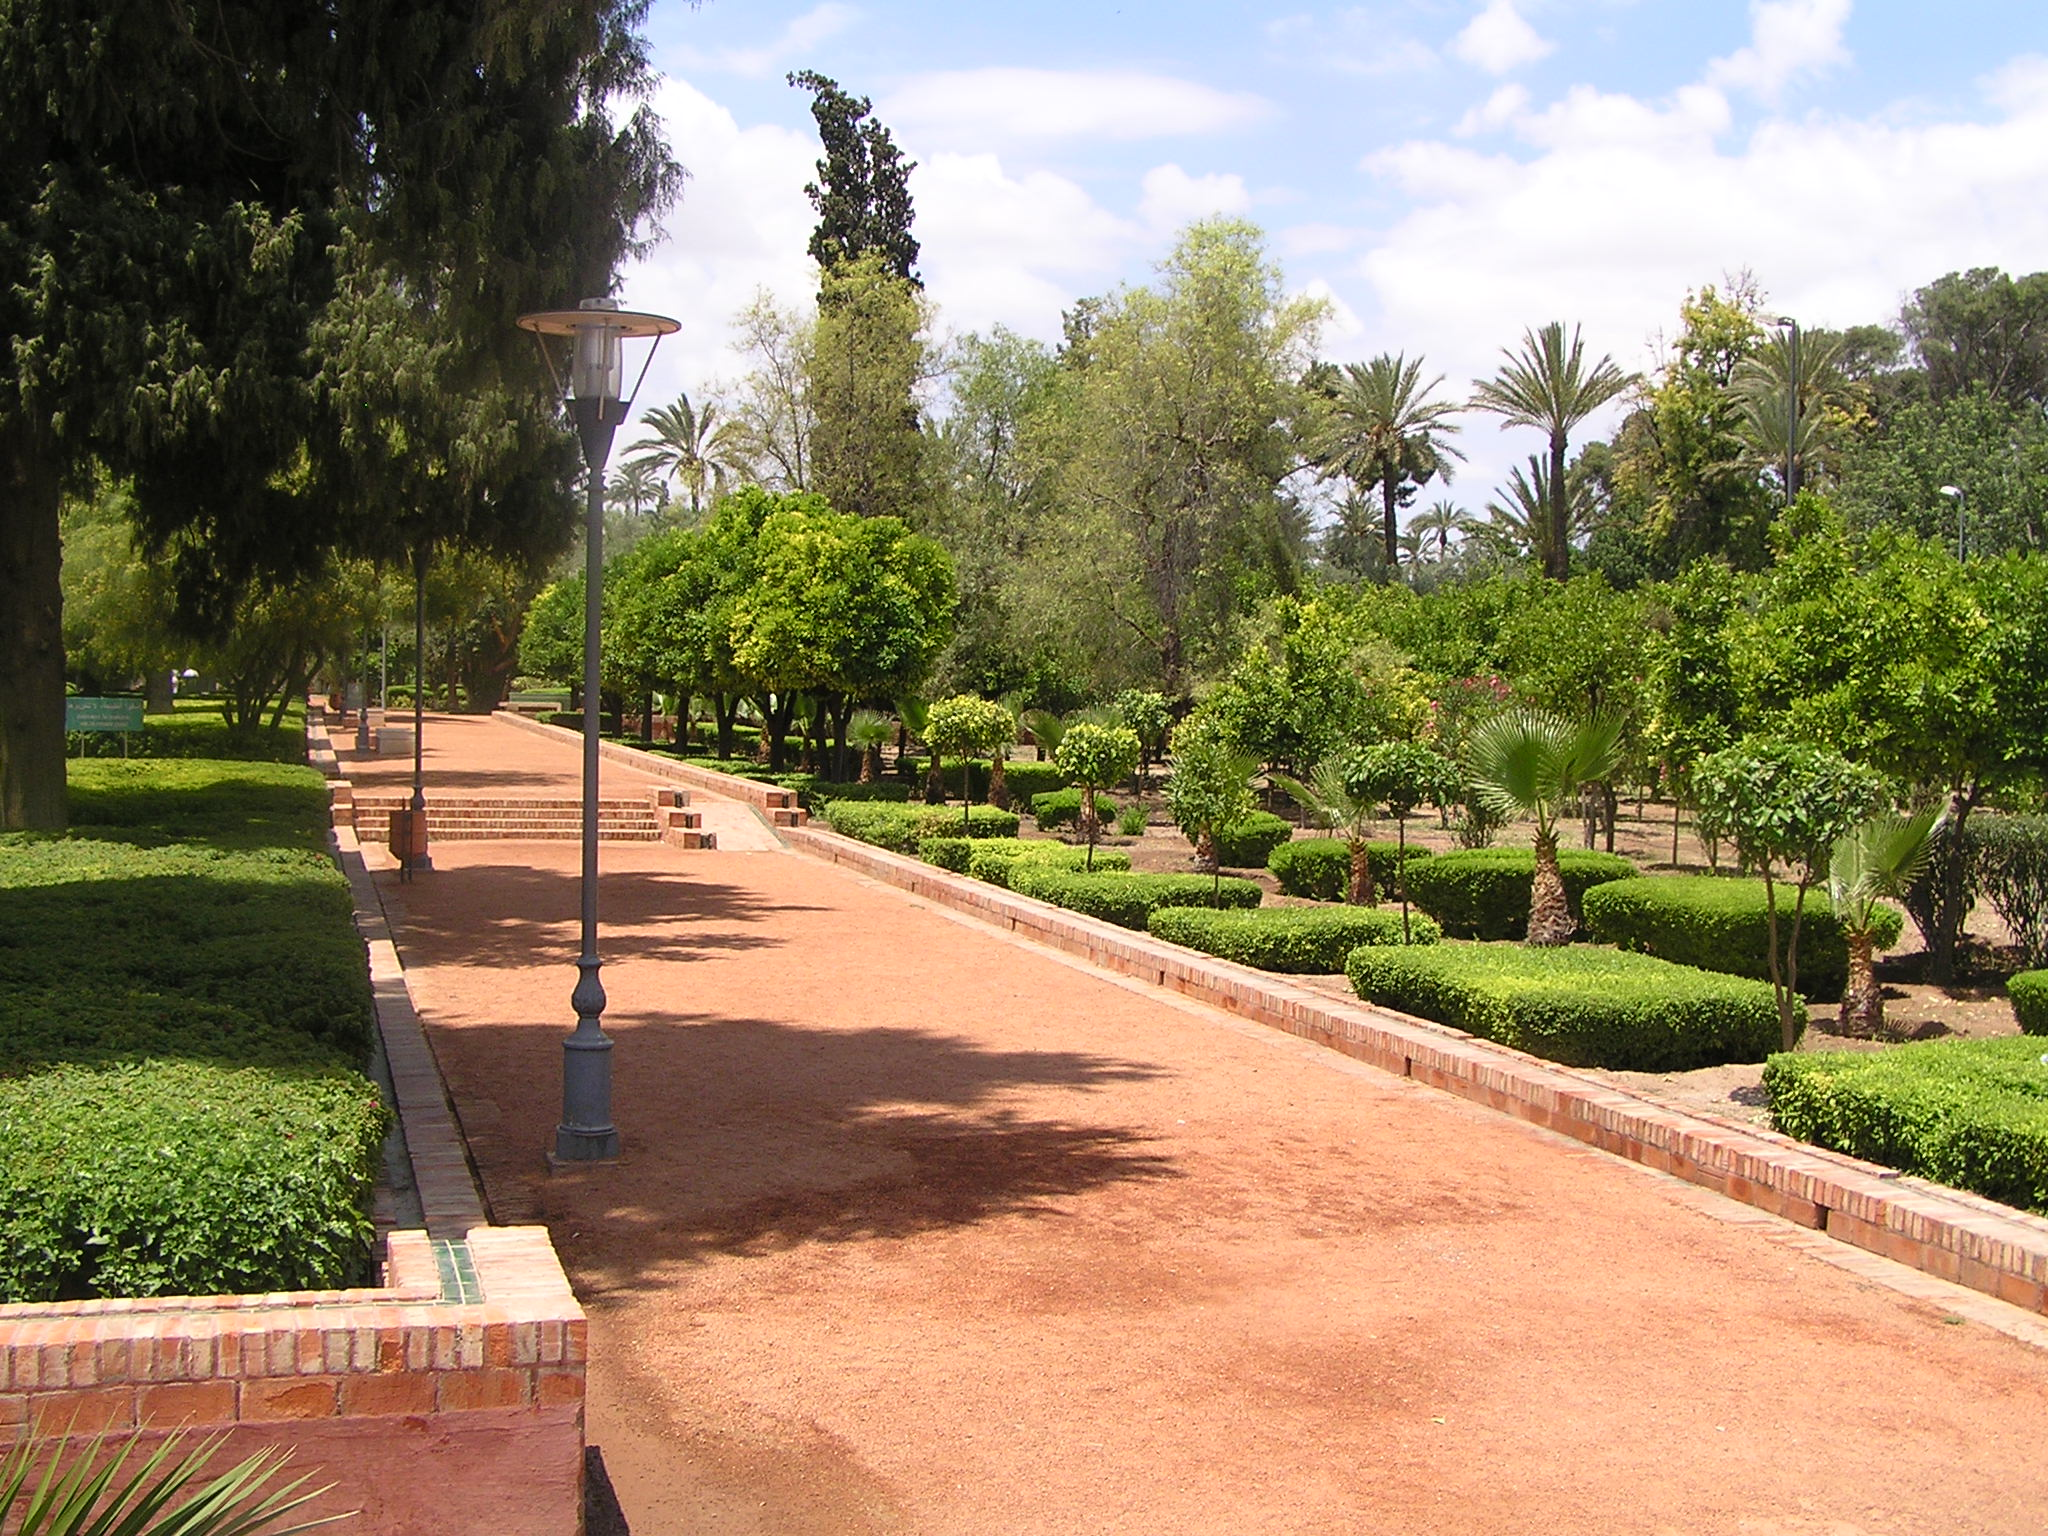 صفقتان لصيانة حدائق مراكش تجاوزت قيمتهما مليارا و600 مليون تثيران جدلا قانونيا